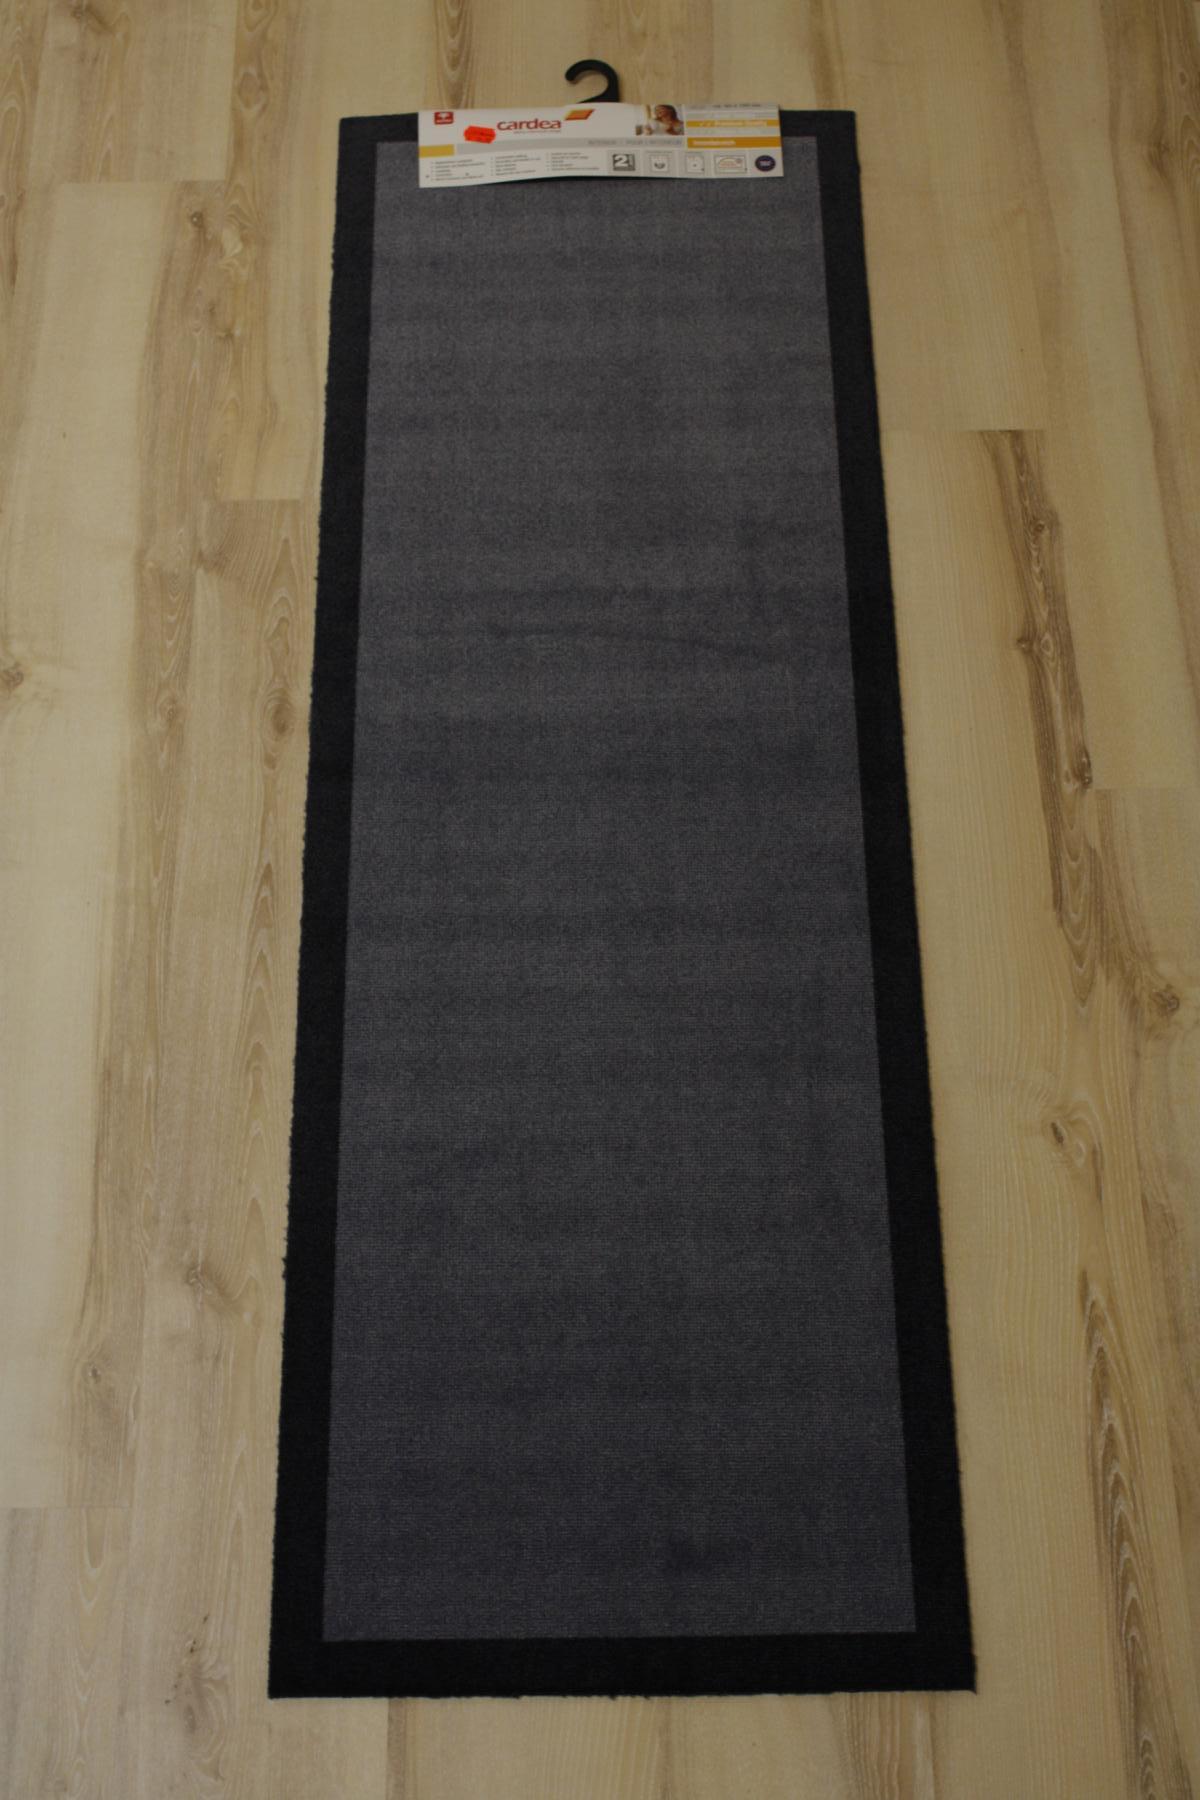 k chenl ufer matte cardea astra 13 fruits uni dunkelgrau 50x150 cm waschbar ebay. Black Bedroom Furniture Sets. Home Design Ideas